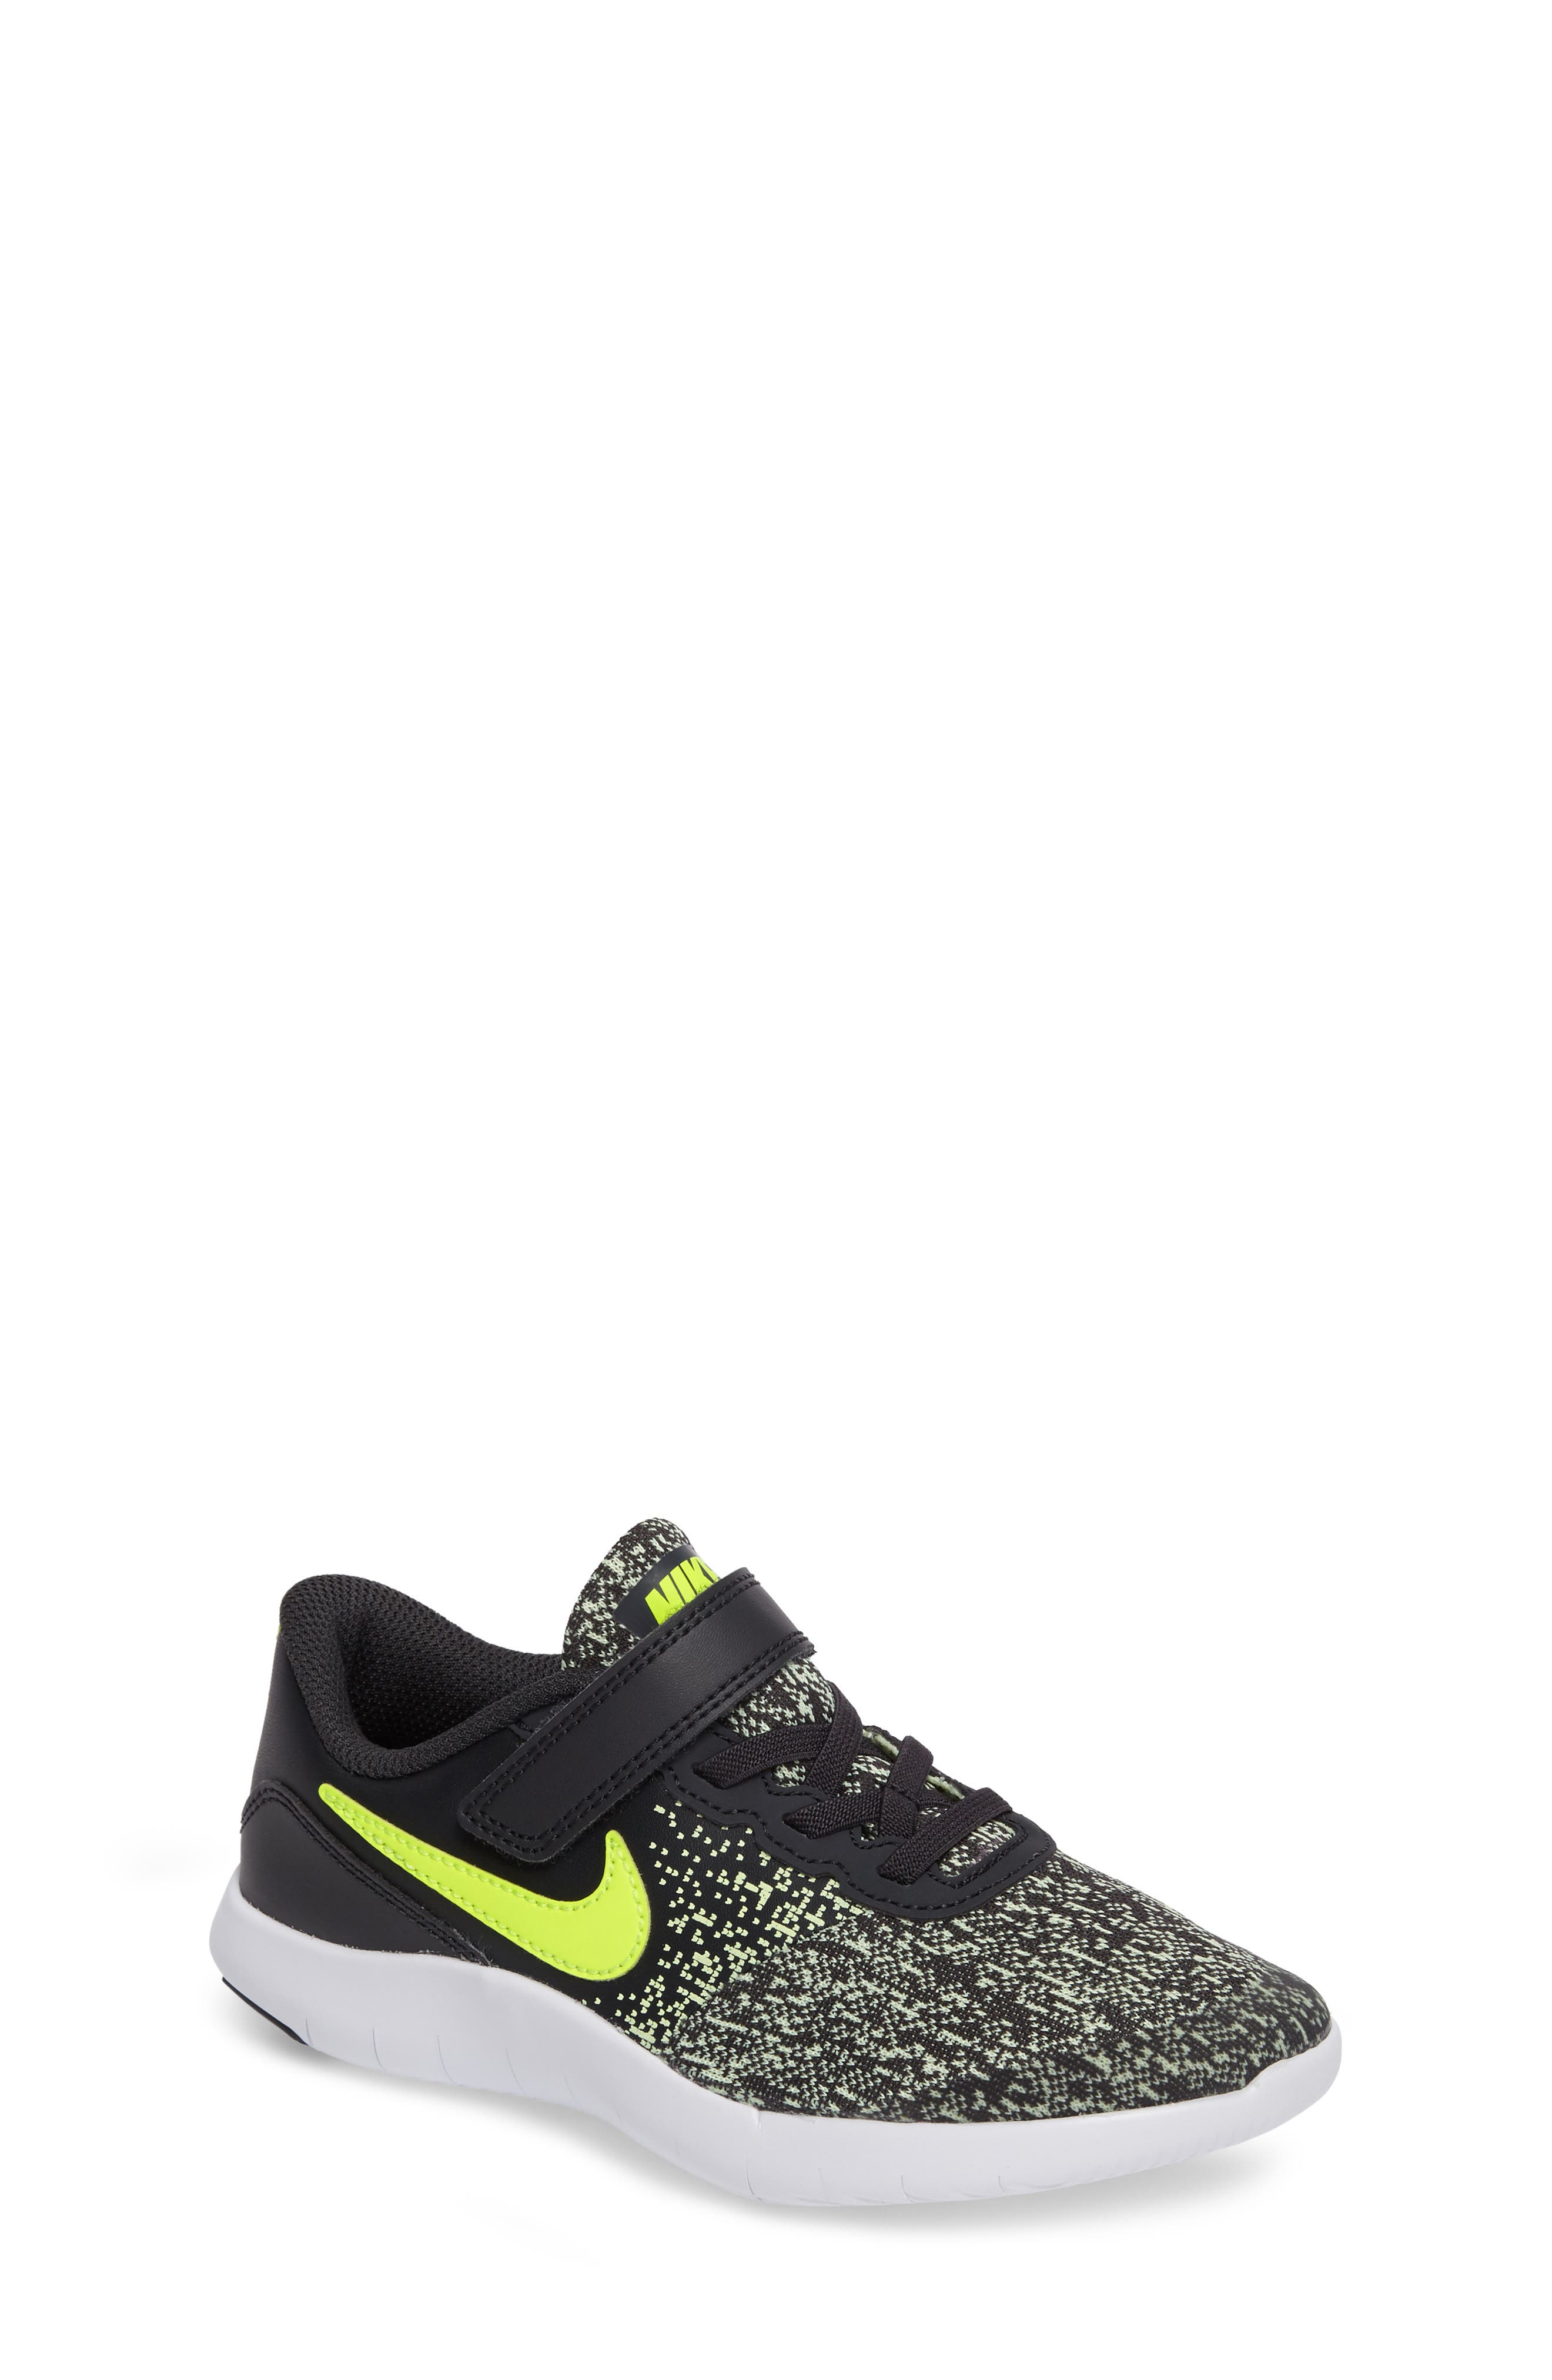 Main Image - Nike Flex Contact Running Shoe (Toddler & Little Kid)